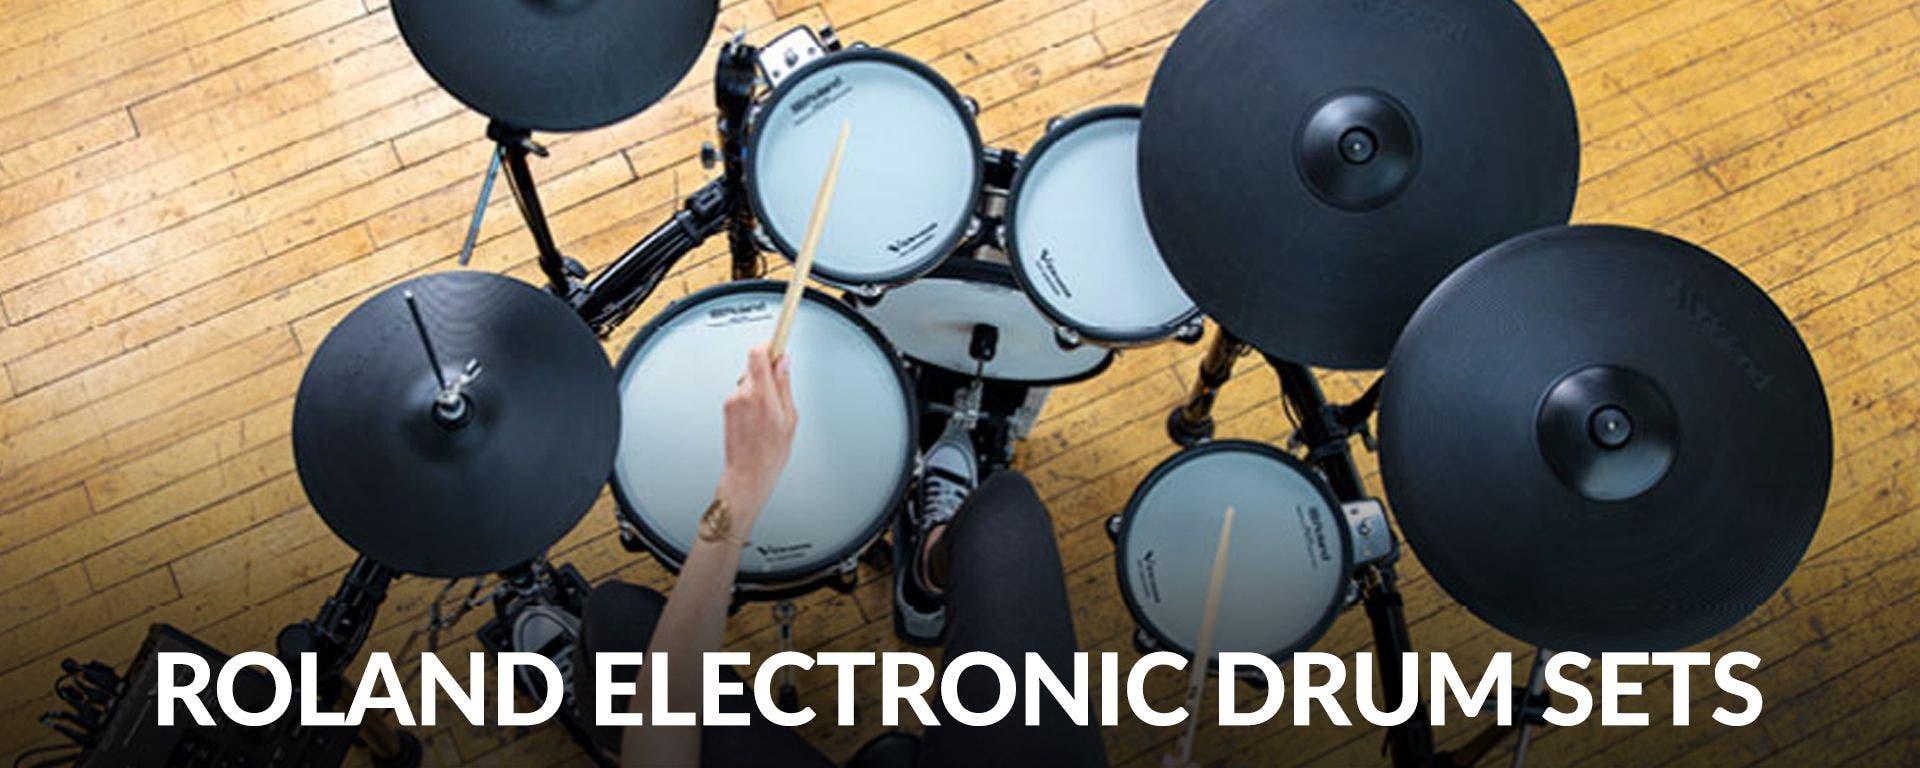 Roland Electronic Drum Sets at Sam Ash